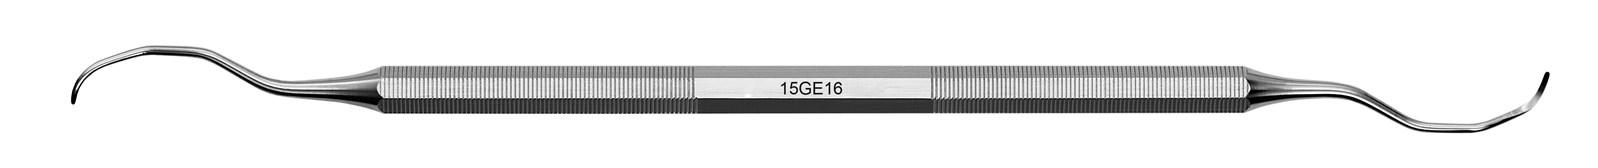 Kyreta Gracey Classic - 15GE16, Bez návleku